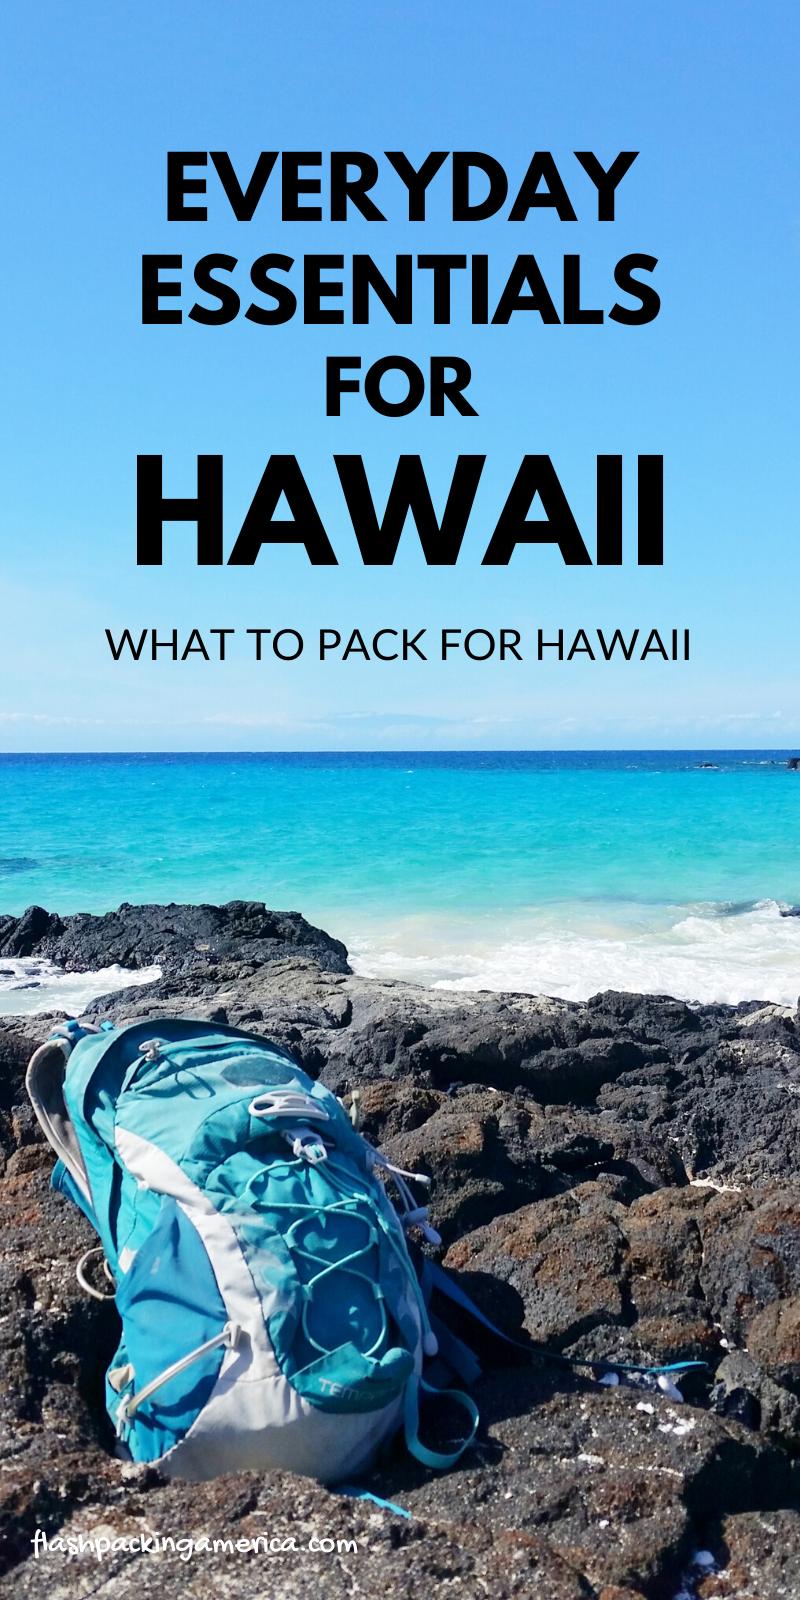 What to pack for Hawaii daypack packing list - Oahu, Maui, Big Island, Kauai